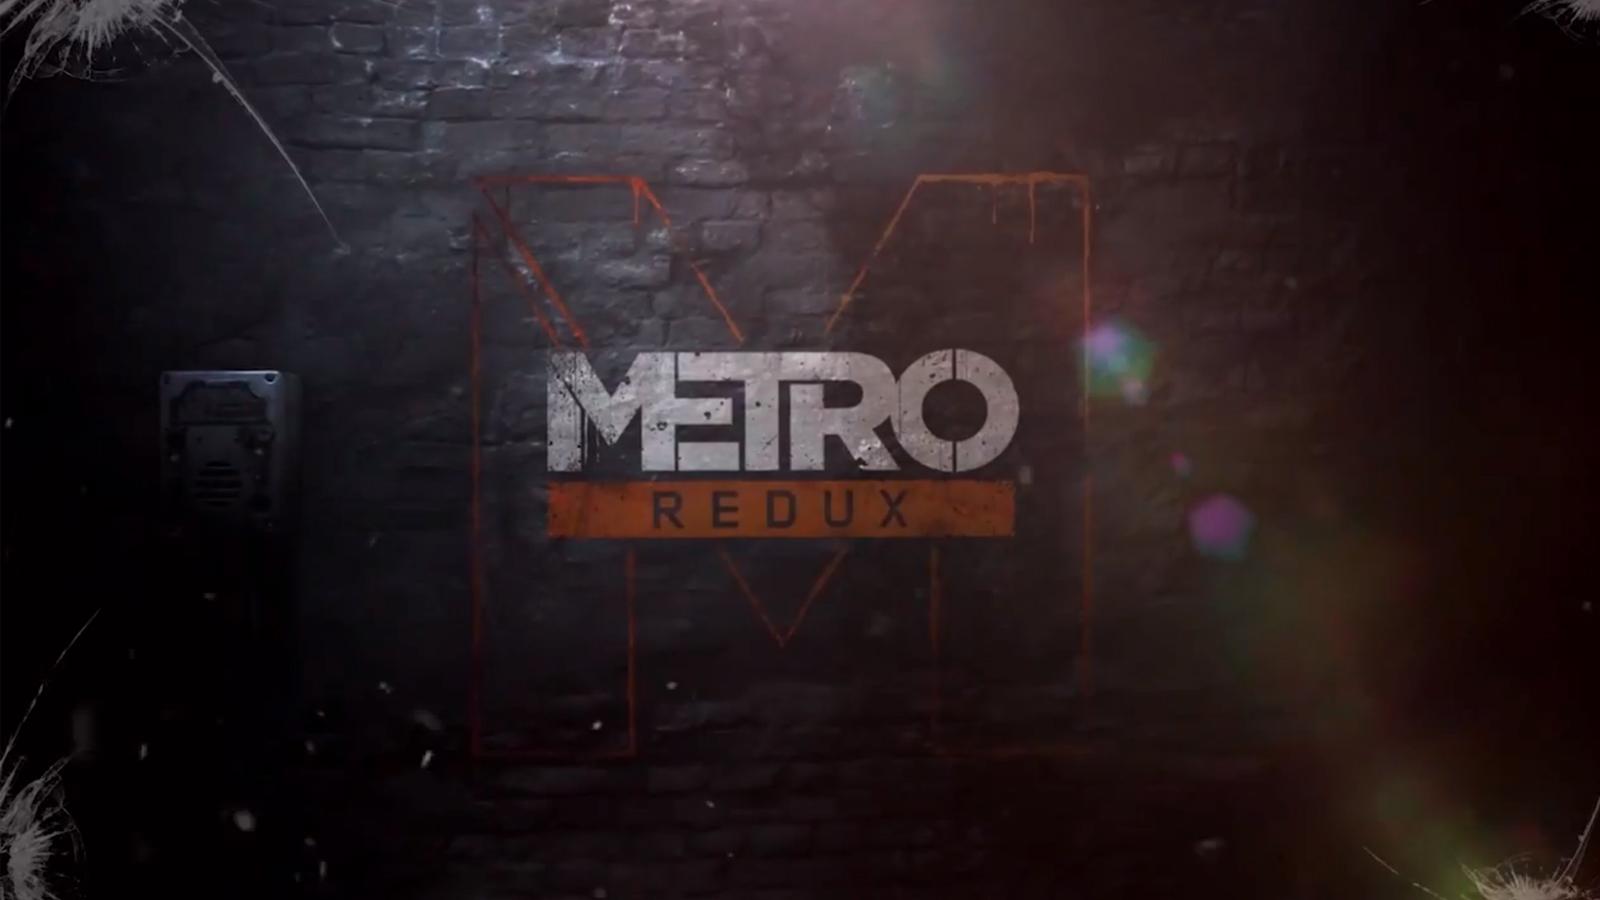 Metro Redux wallpaper 1